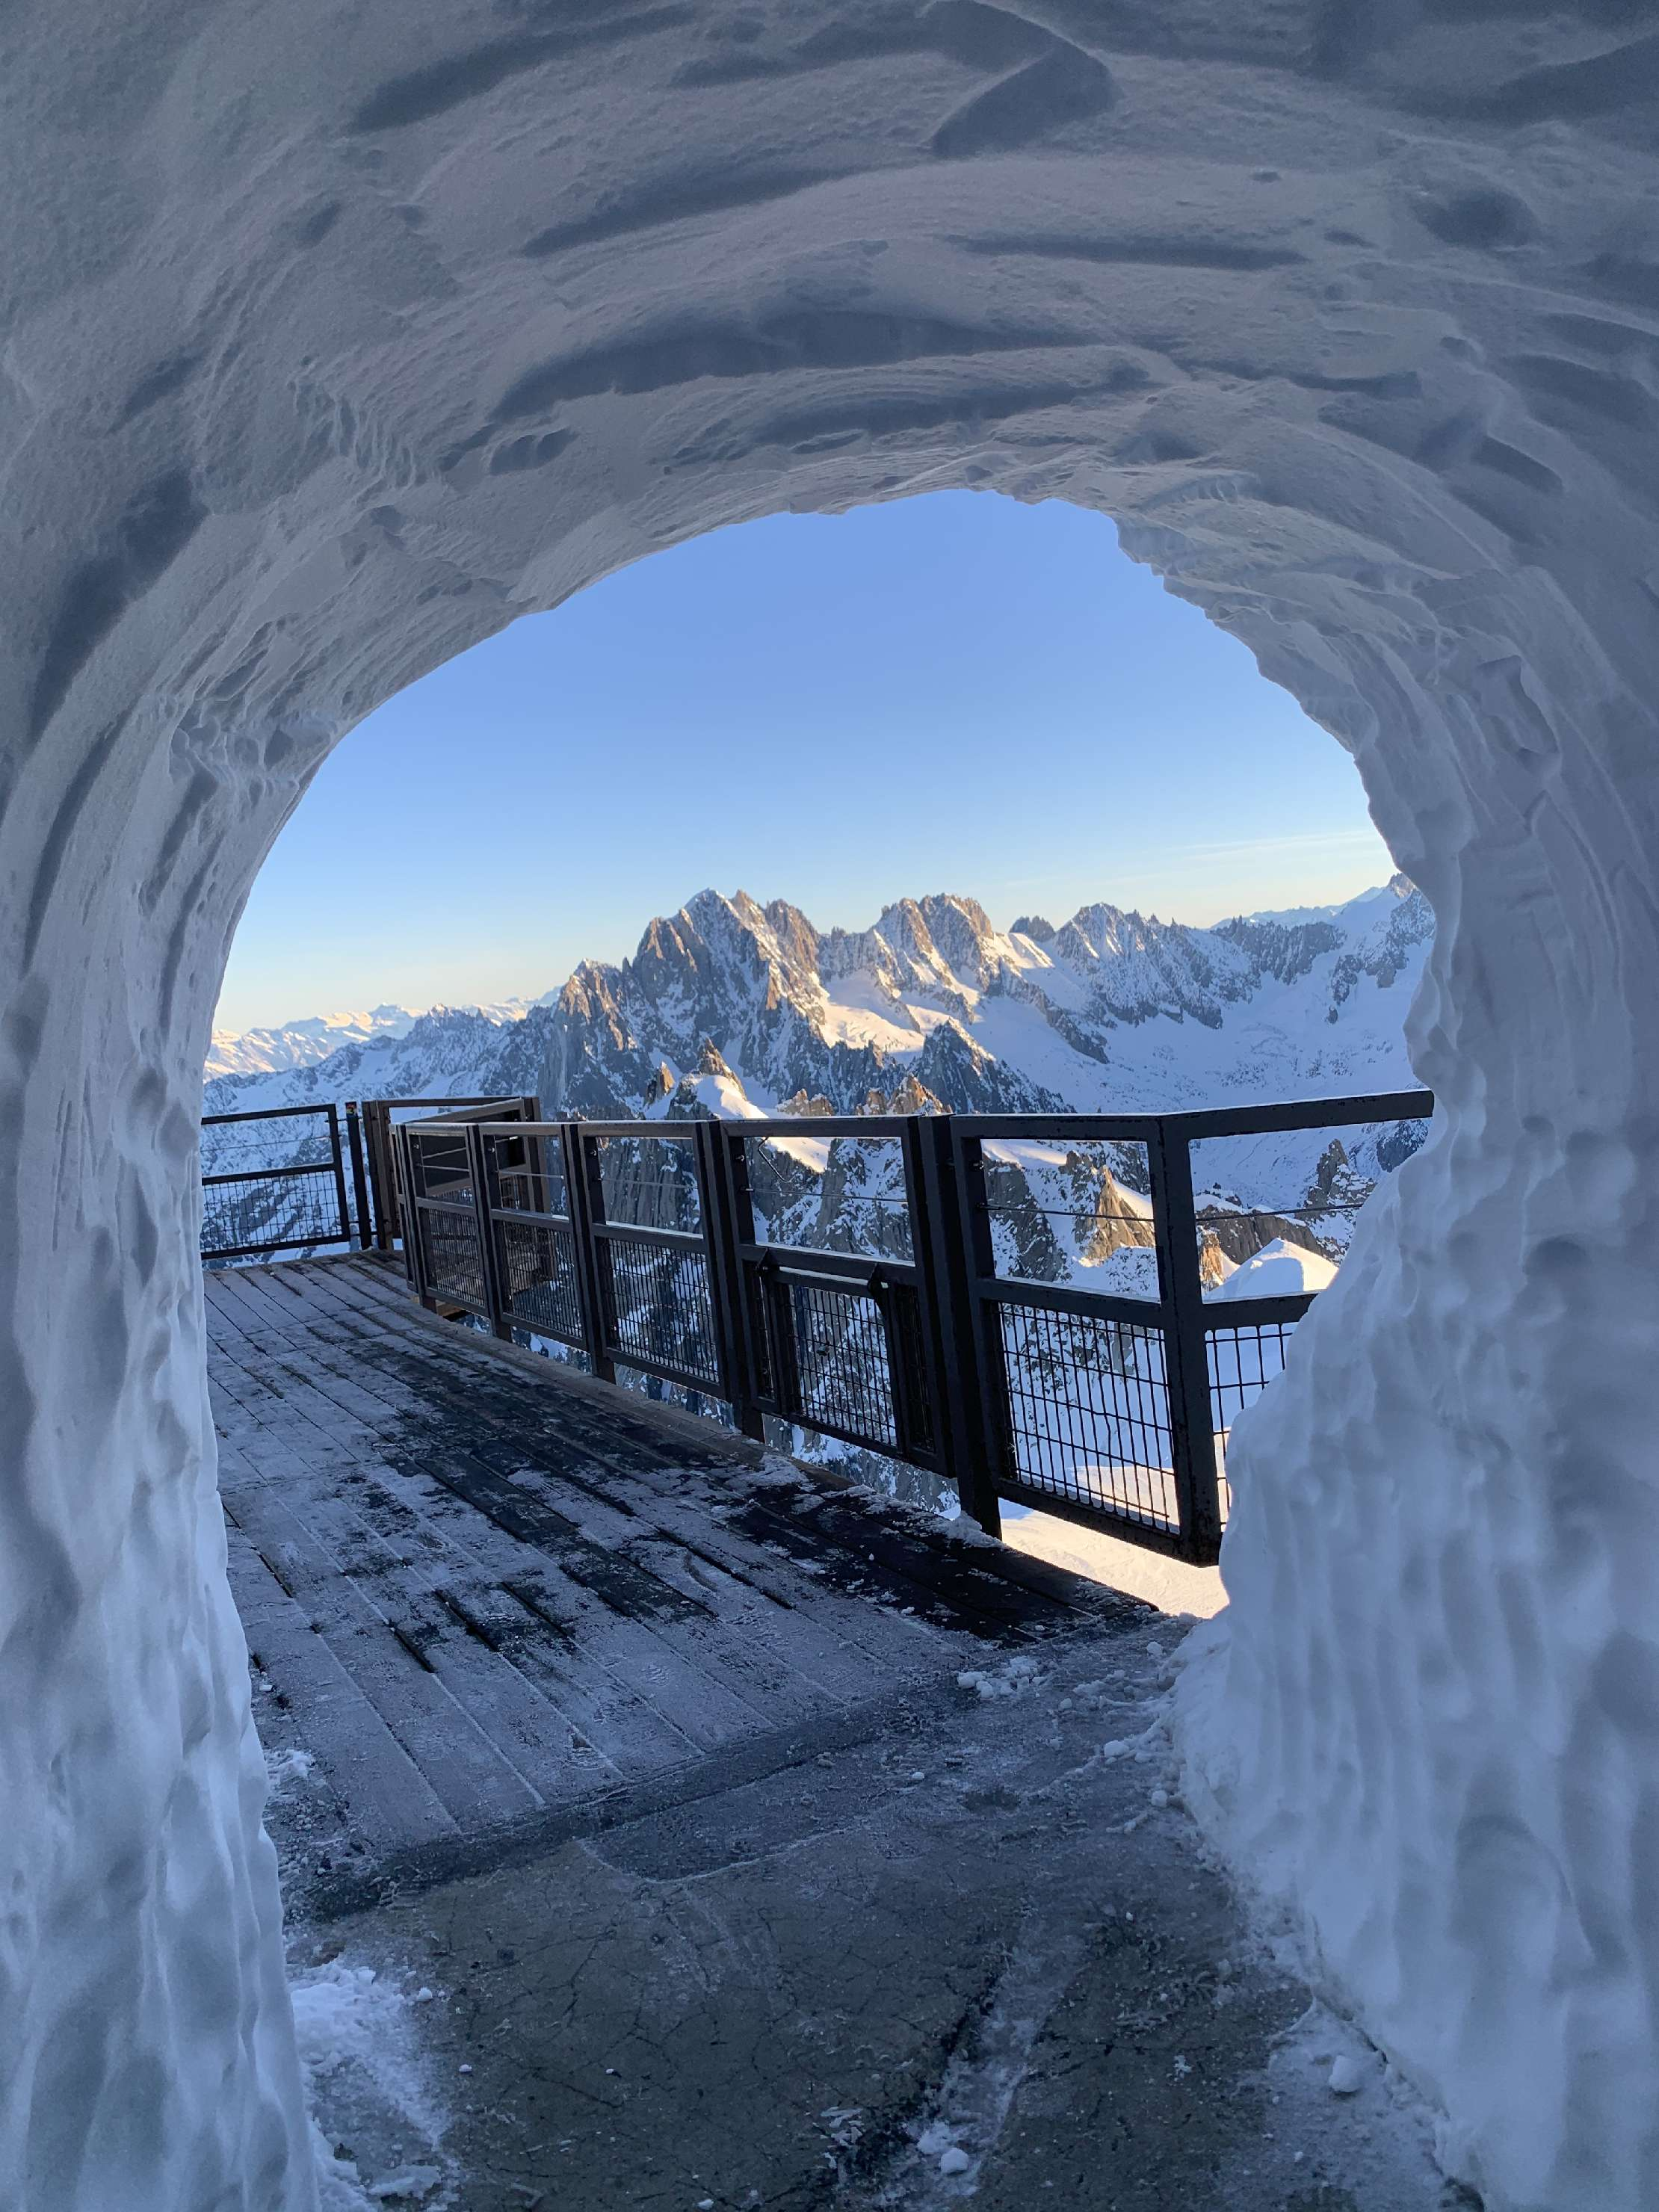 Tunnel du Mont-Blanc, 74400 Chamonix-Mont-Blanc Rhône-Alpes, France